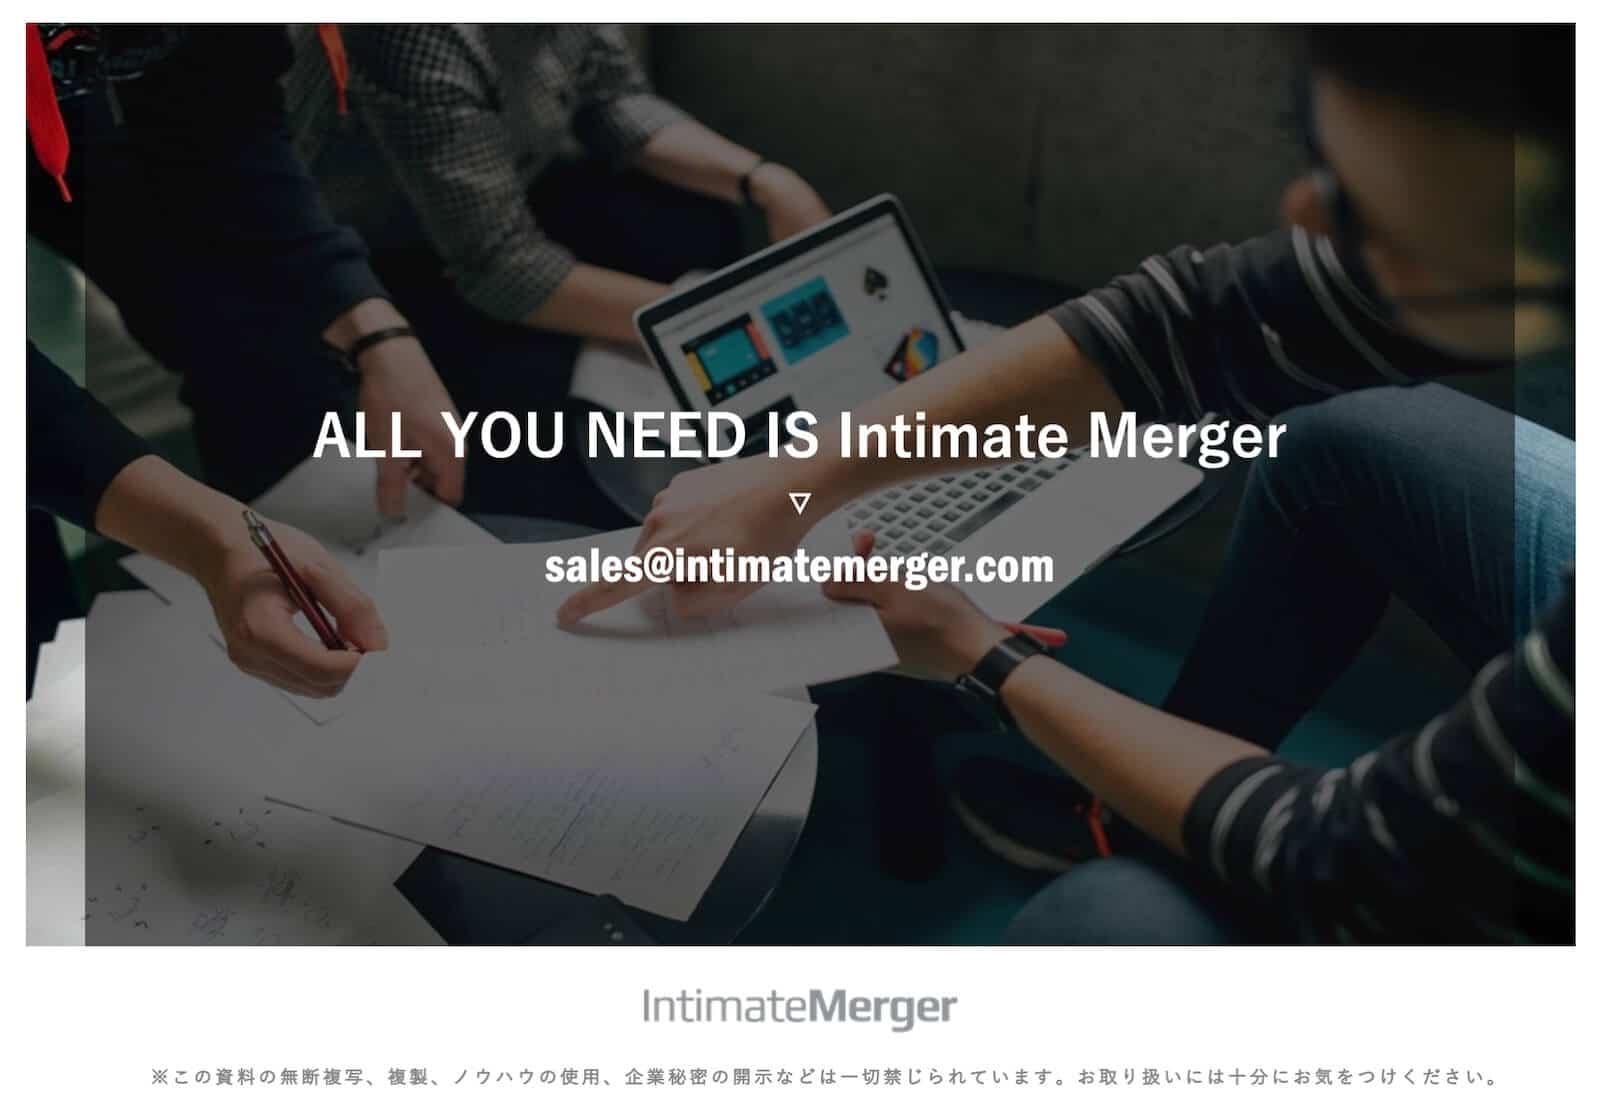 Intimate Merger問い合わせ先